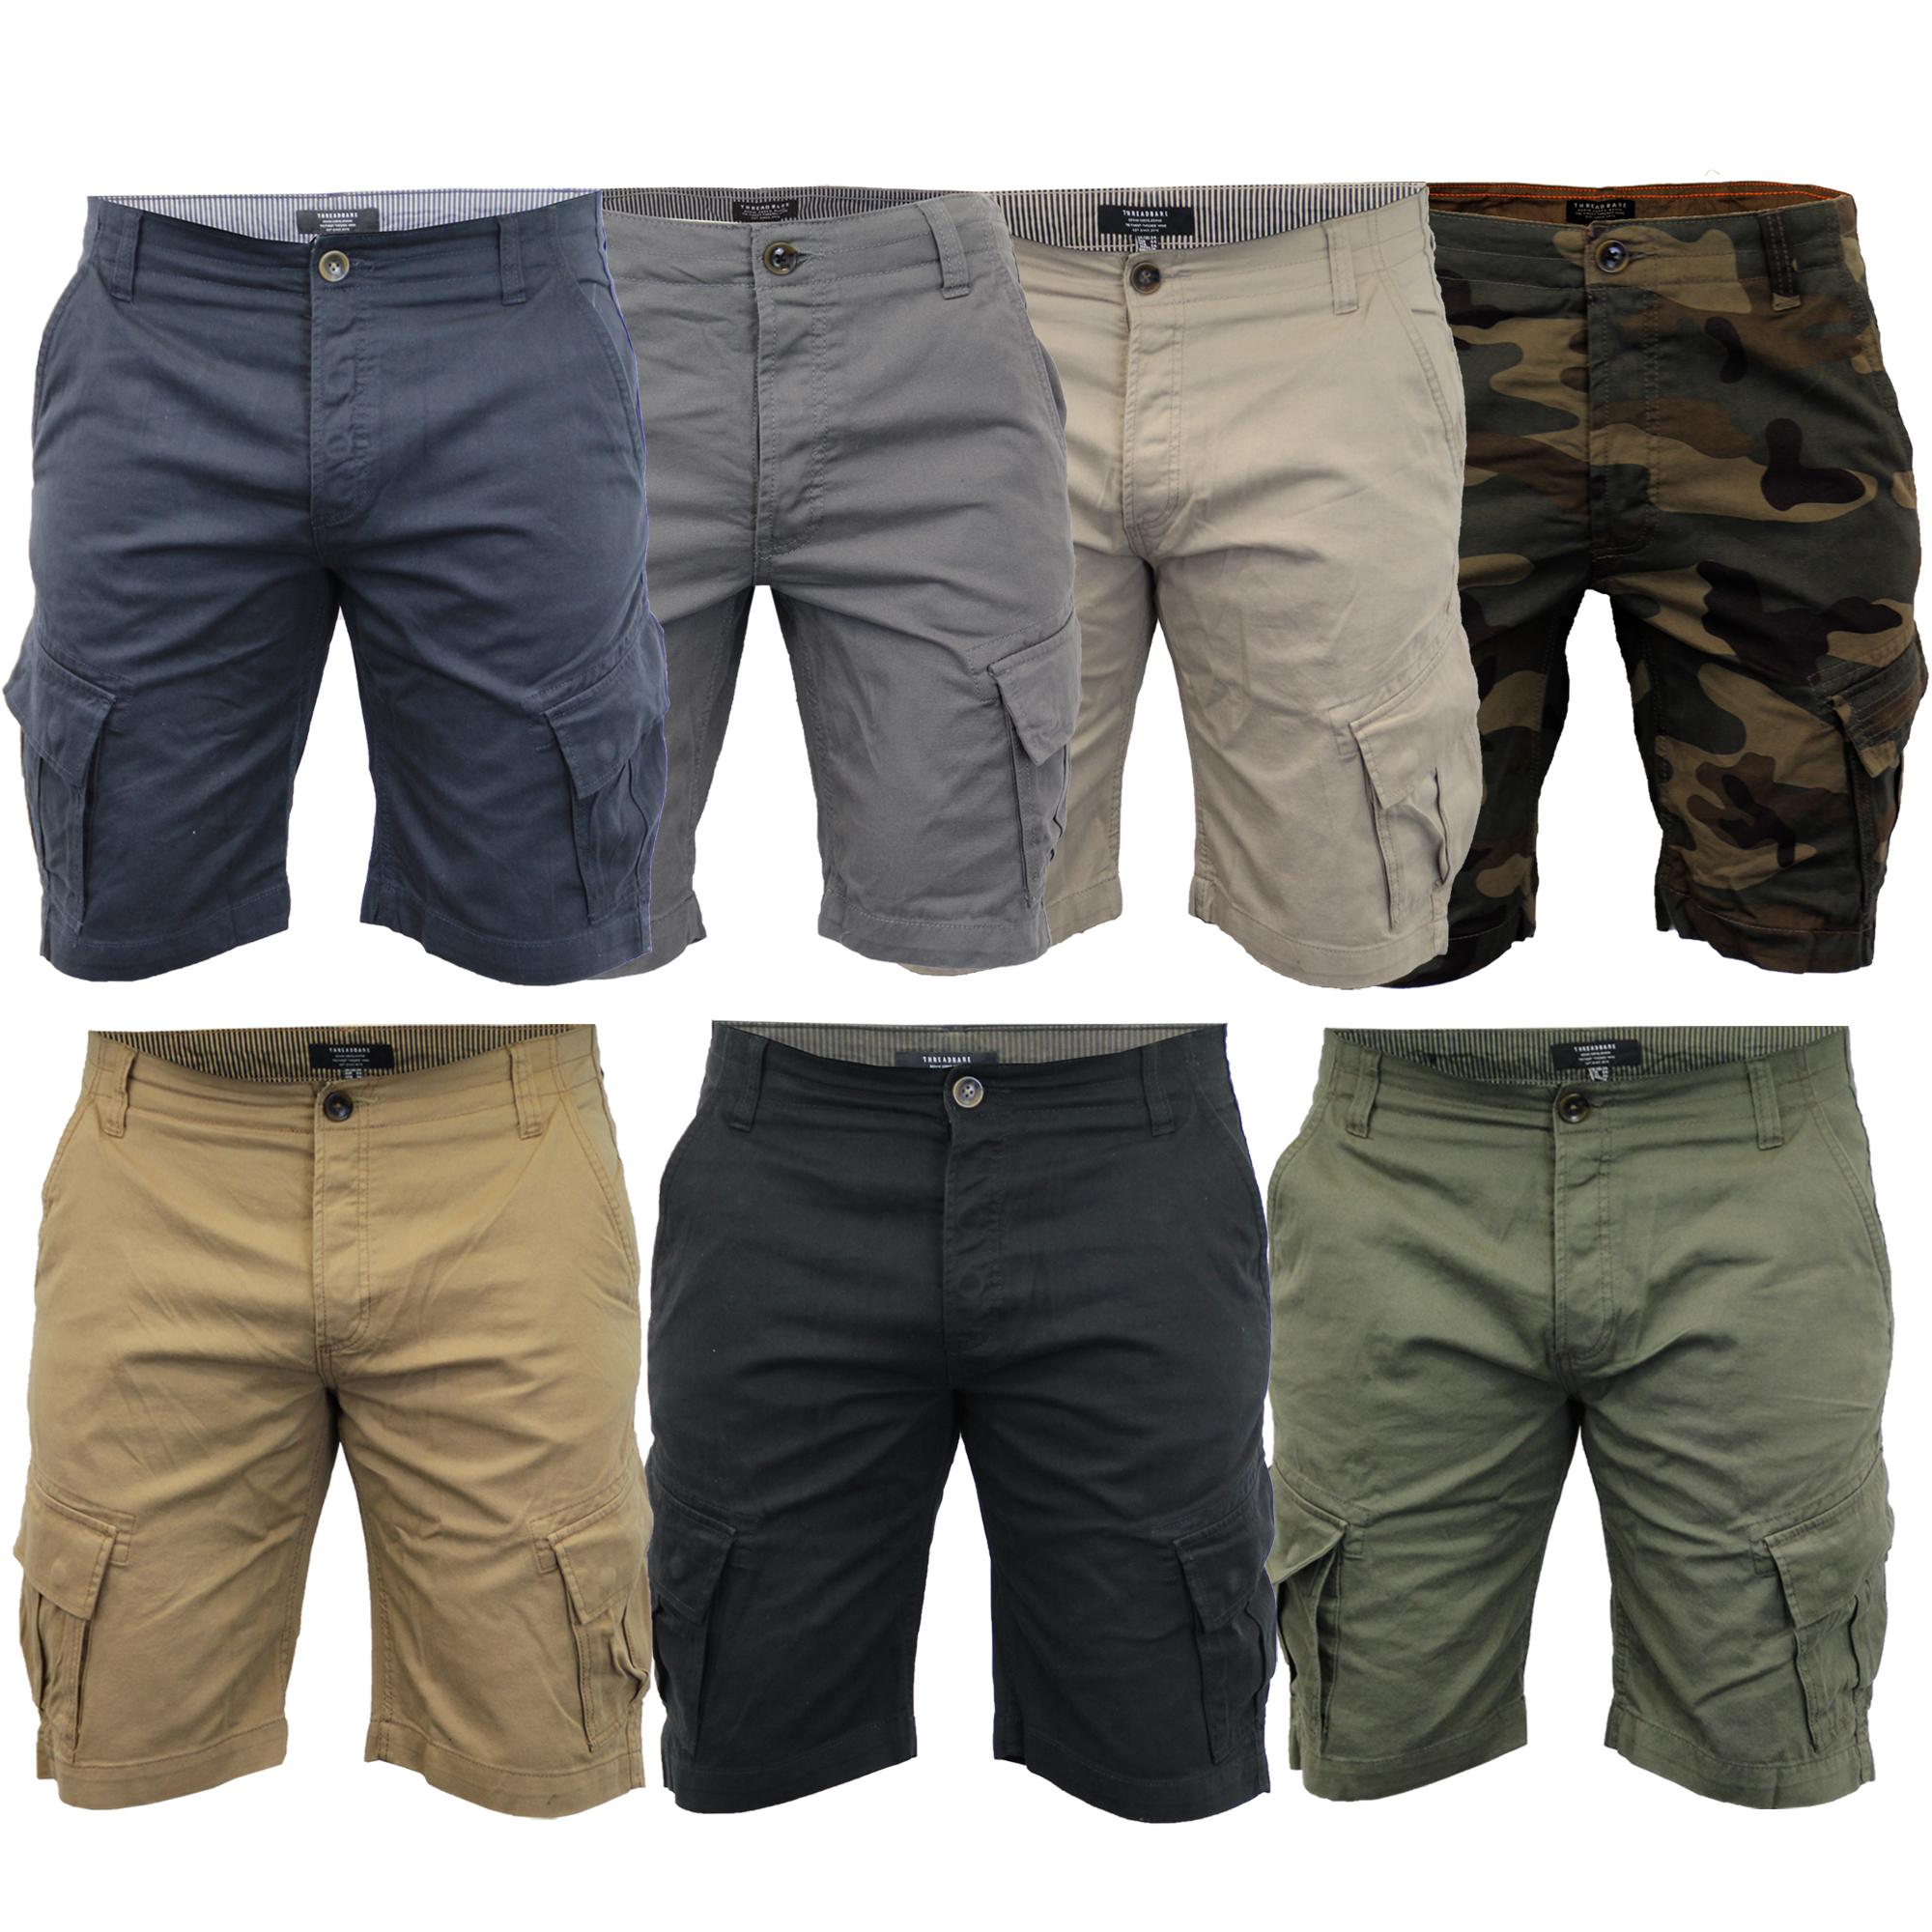 Mens-Cargo-Chino-Shorts-Threadbare-Combat-Knee-Length-Westace-Military-Summer thumbnail 6